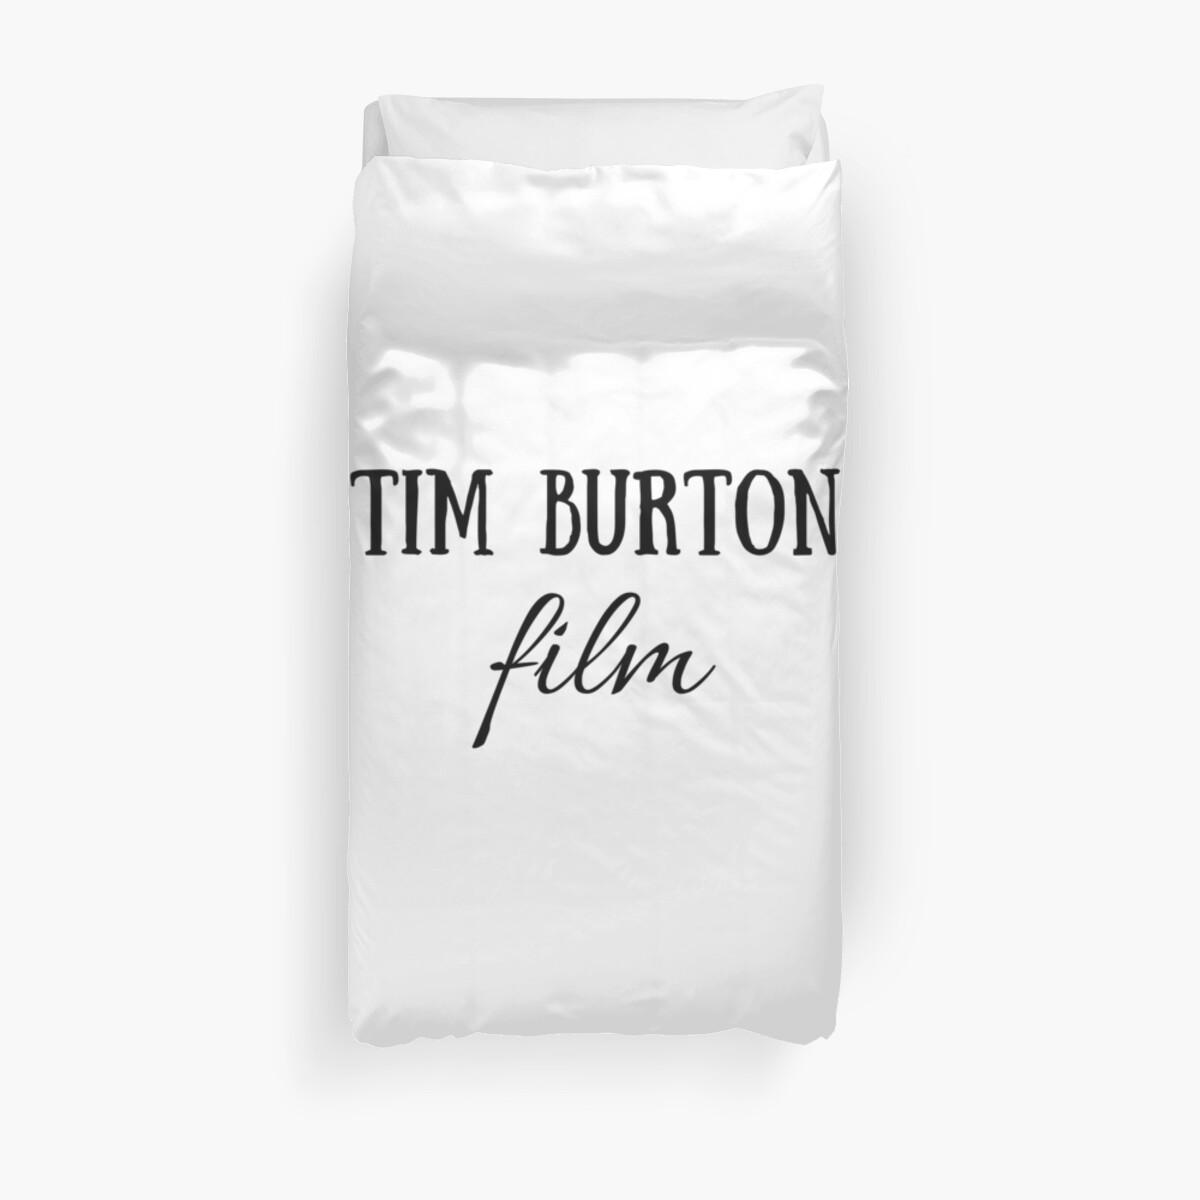 Tim Burton Film Quote Gift Present Cinema Culture World Good